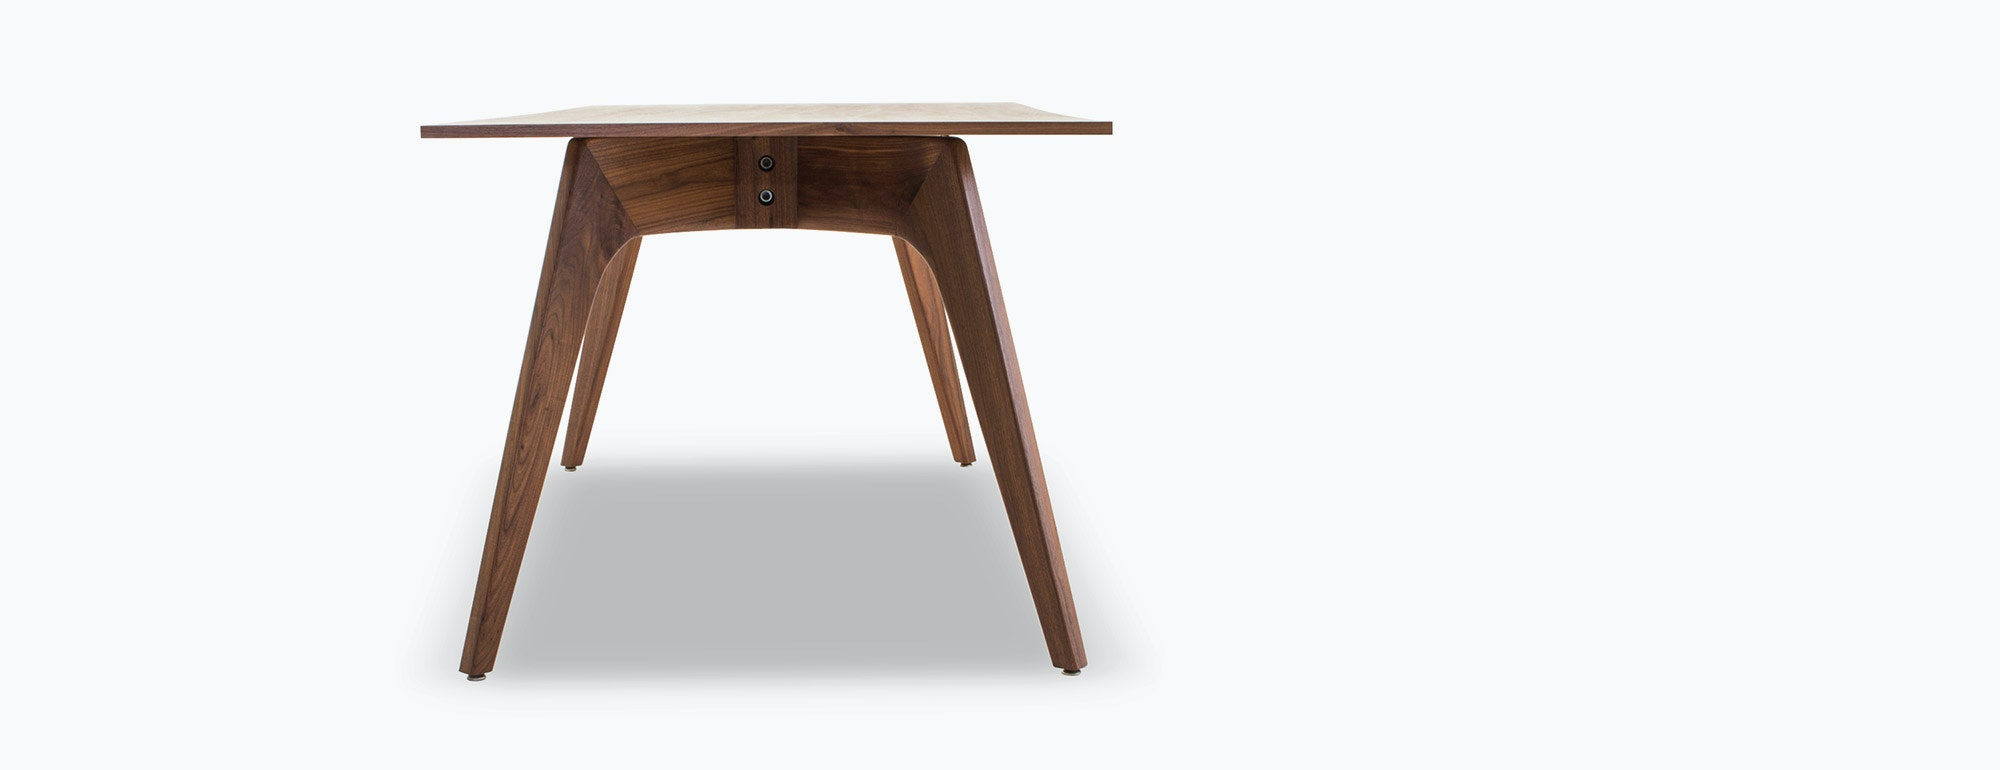 Hesse Wood Top Dining Table Joybird